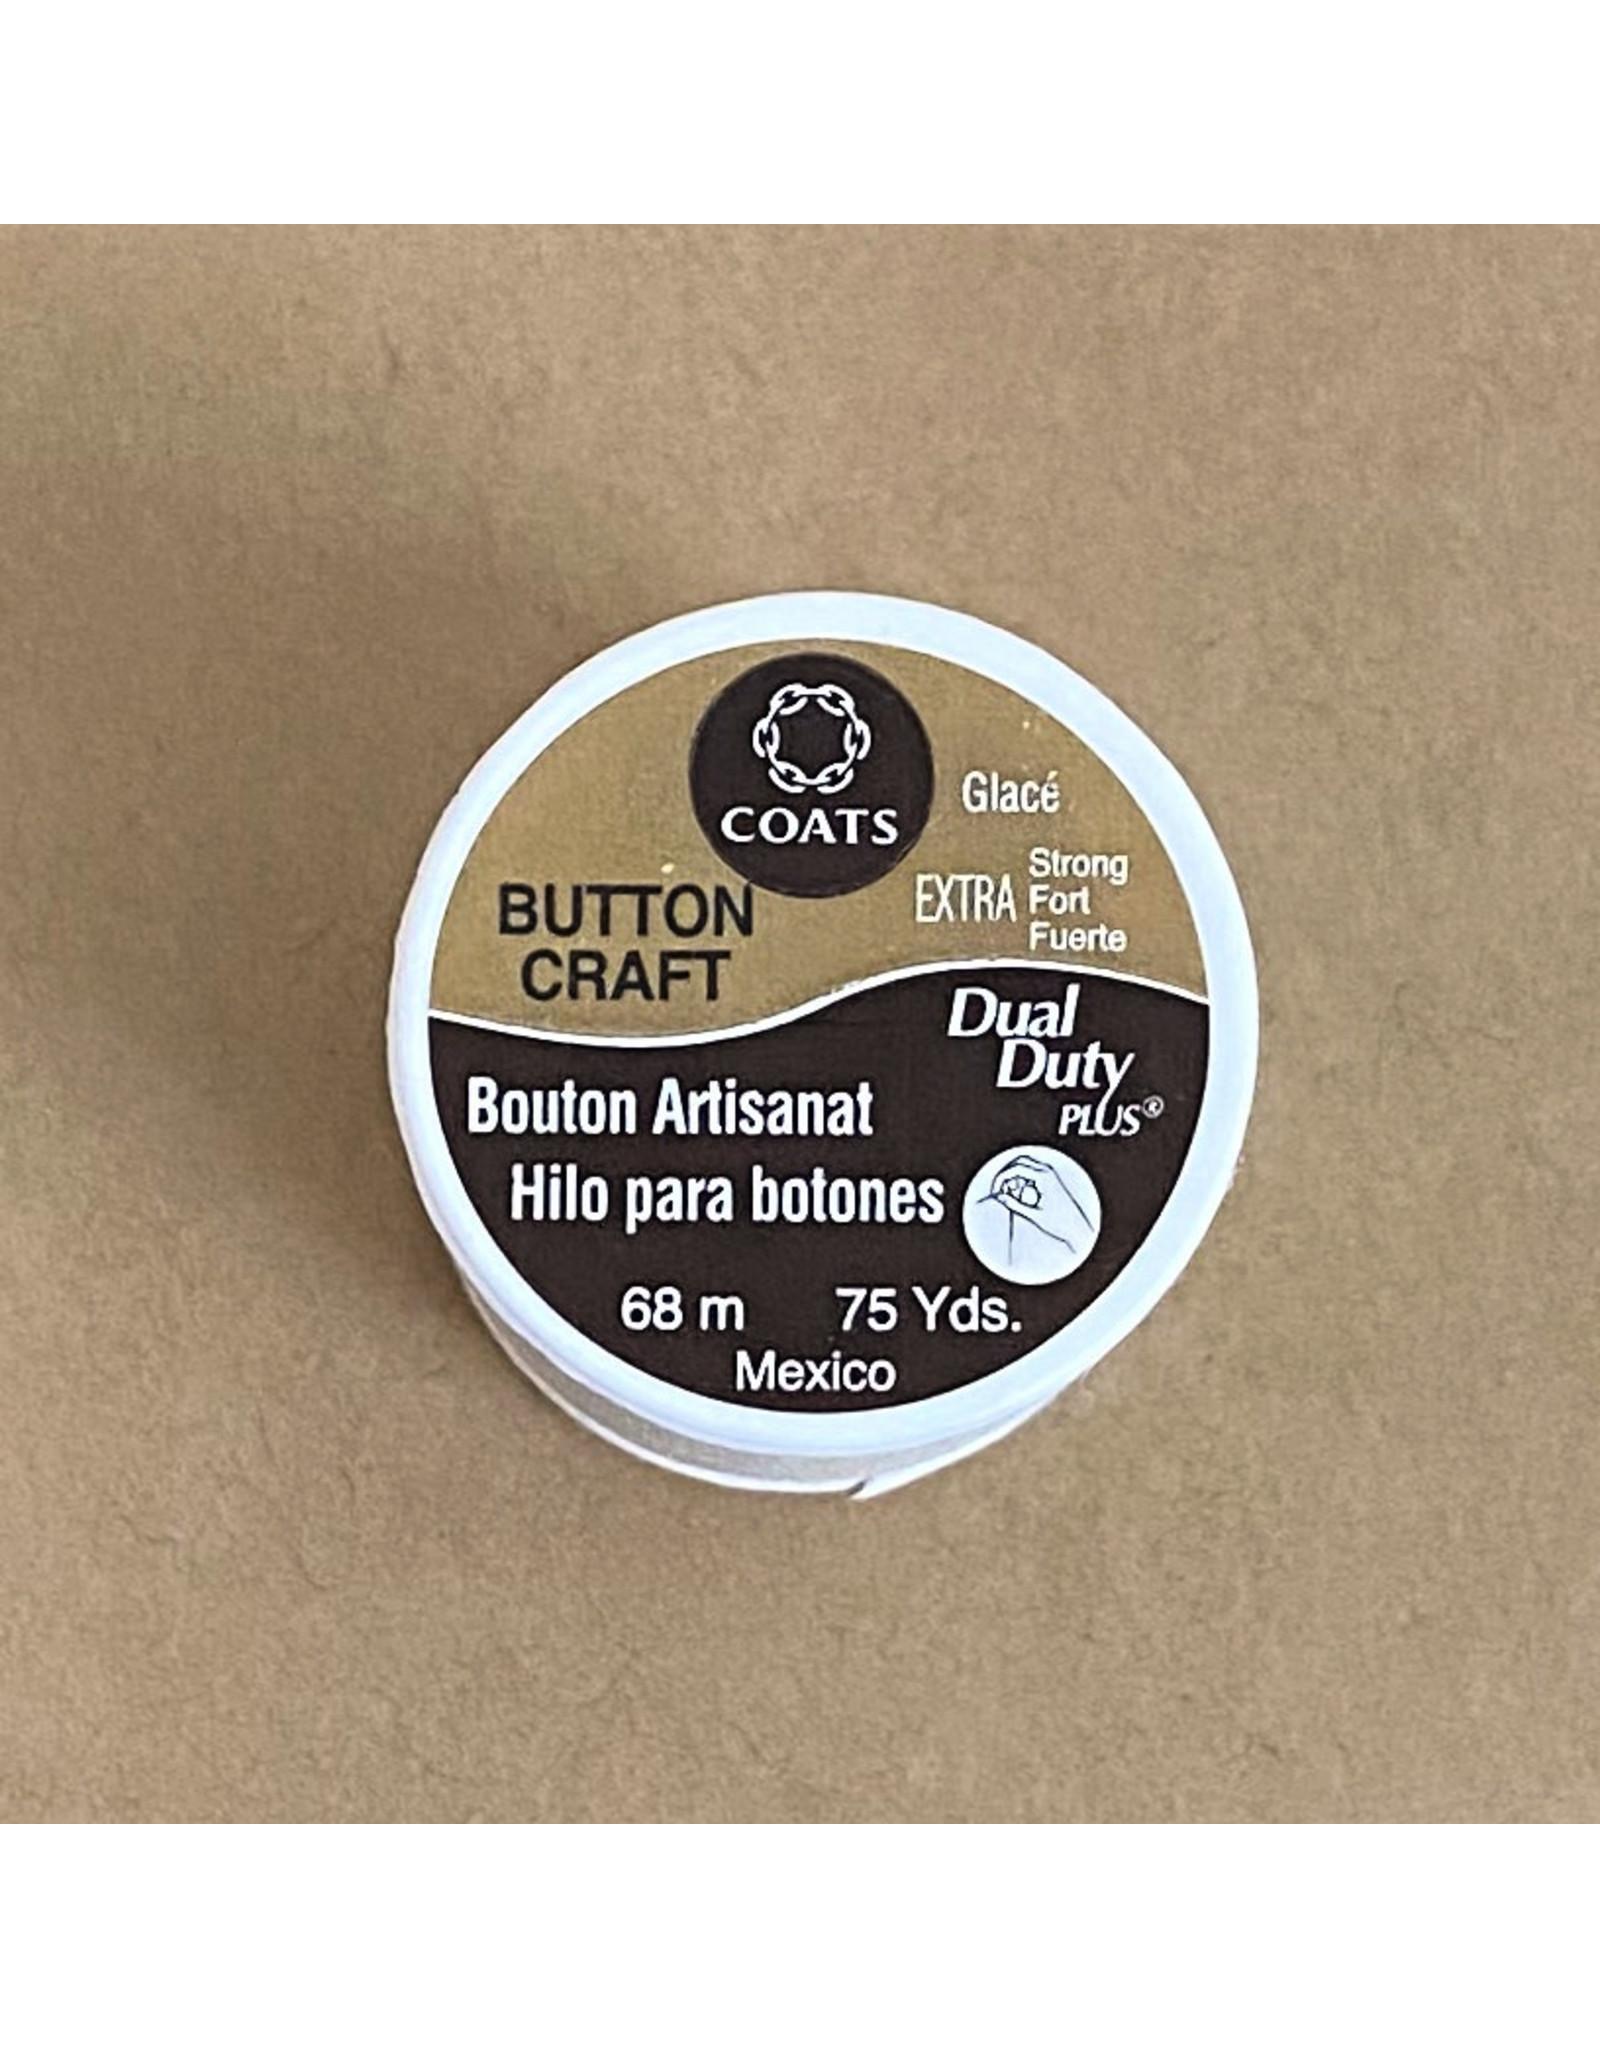 Coats & Clark Button Craft Thread, Dual Duty Plus, Color: Burgandy